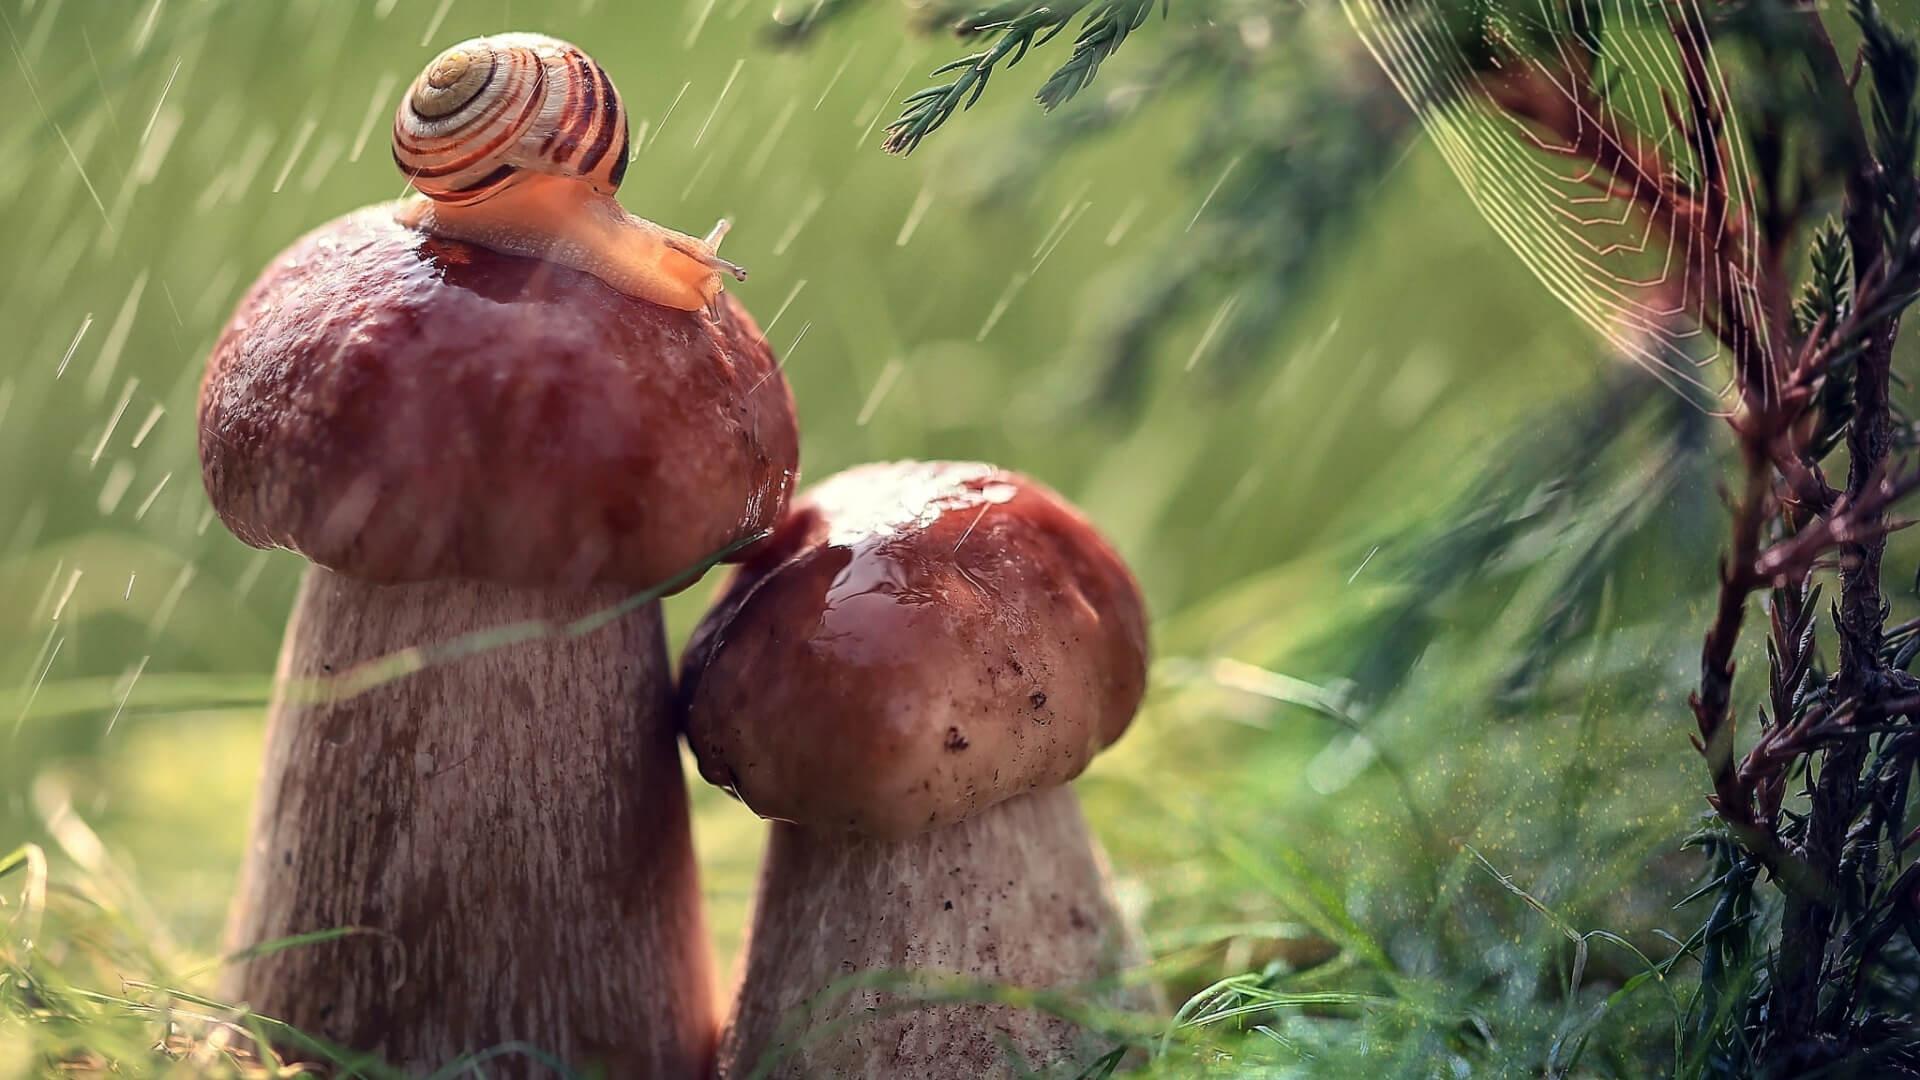 Macro Mushrooms computer background